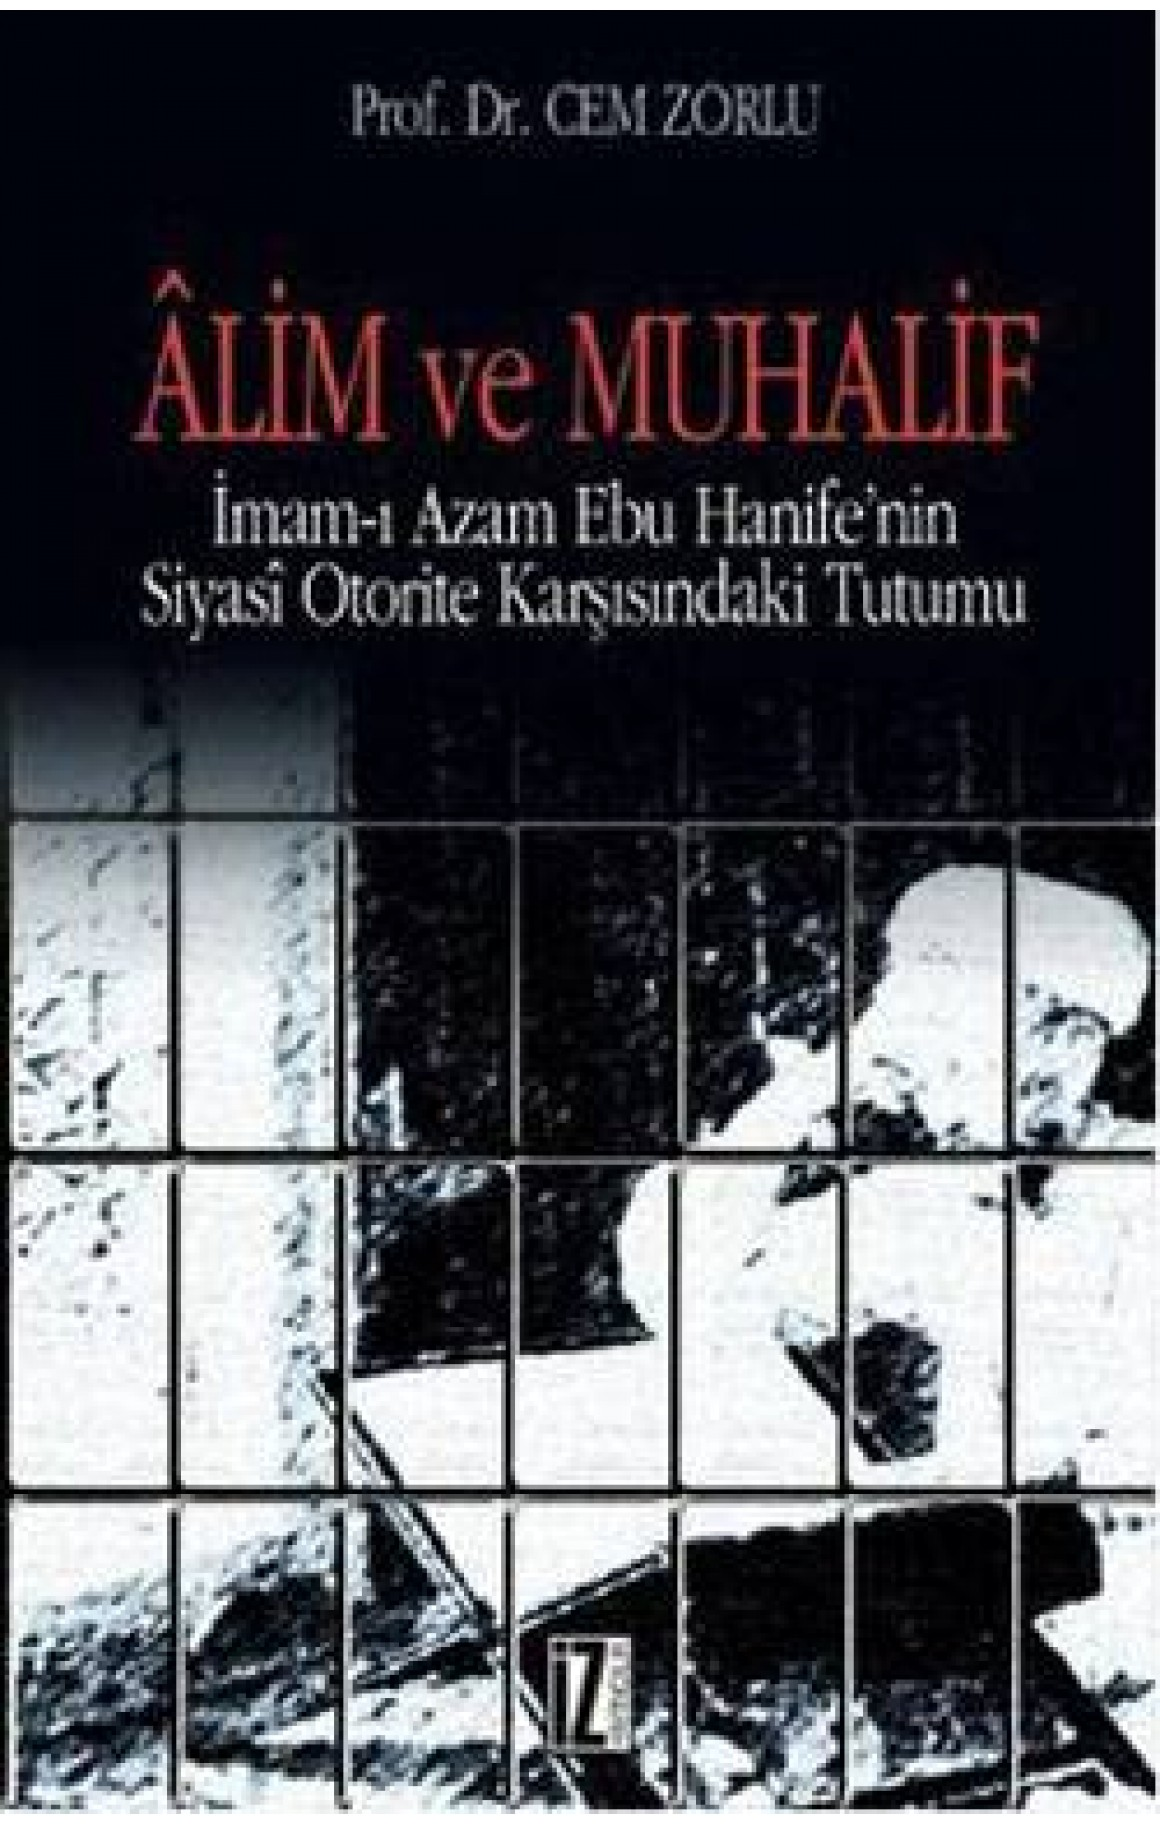 Alim ve Muhalif